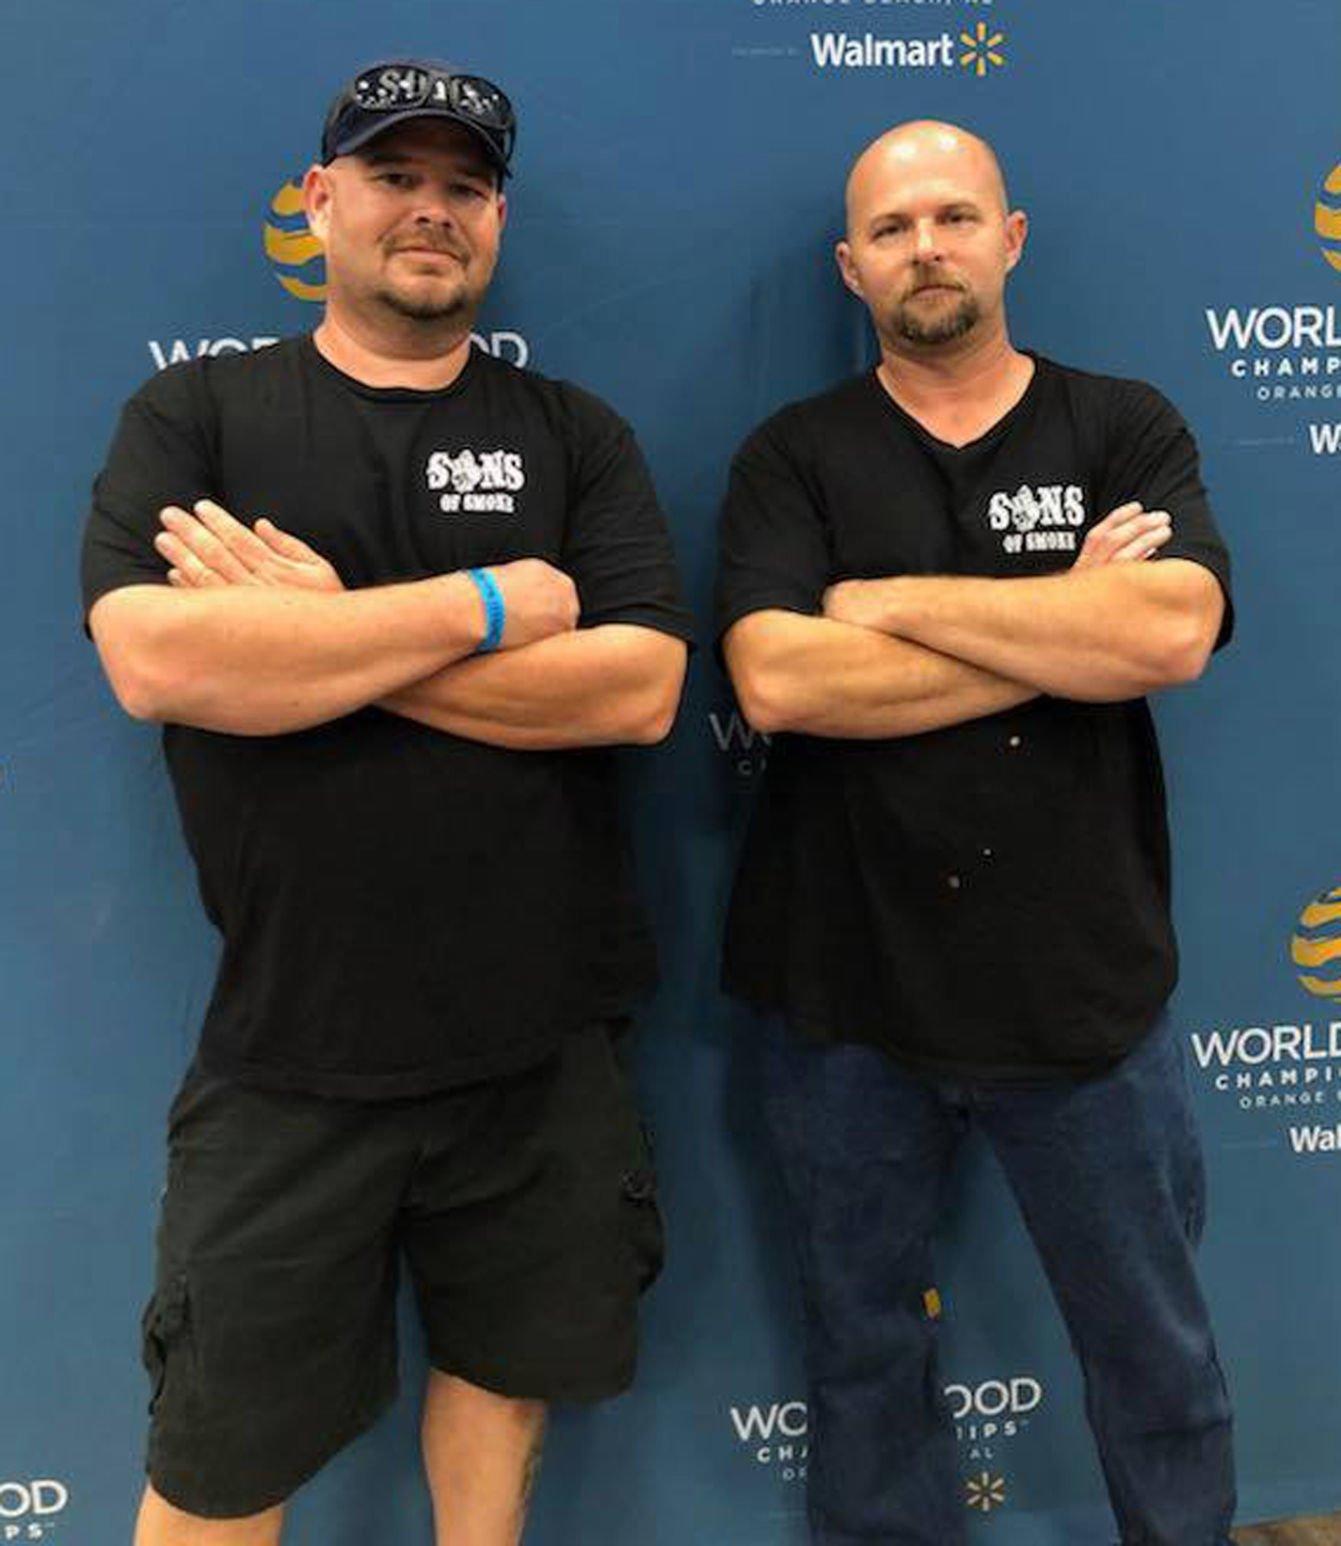 BBQ team takes on world